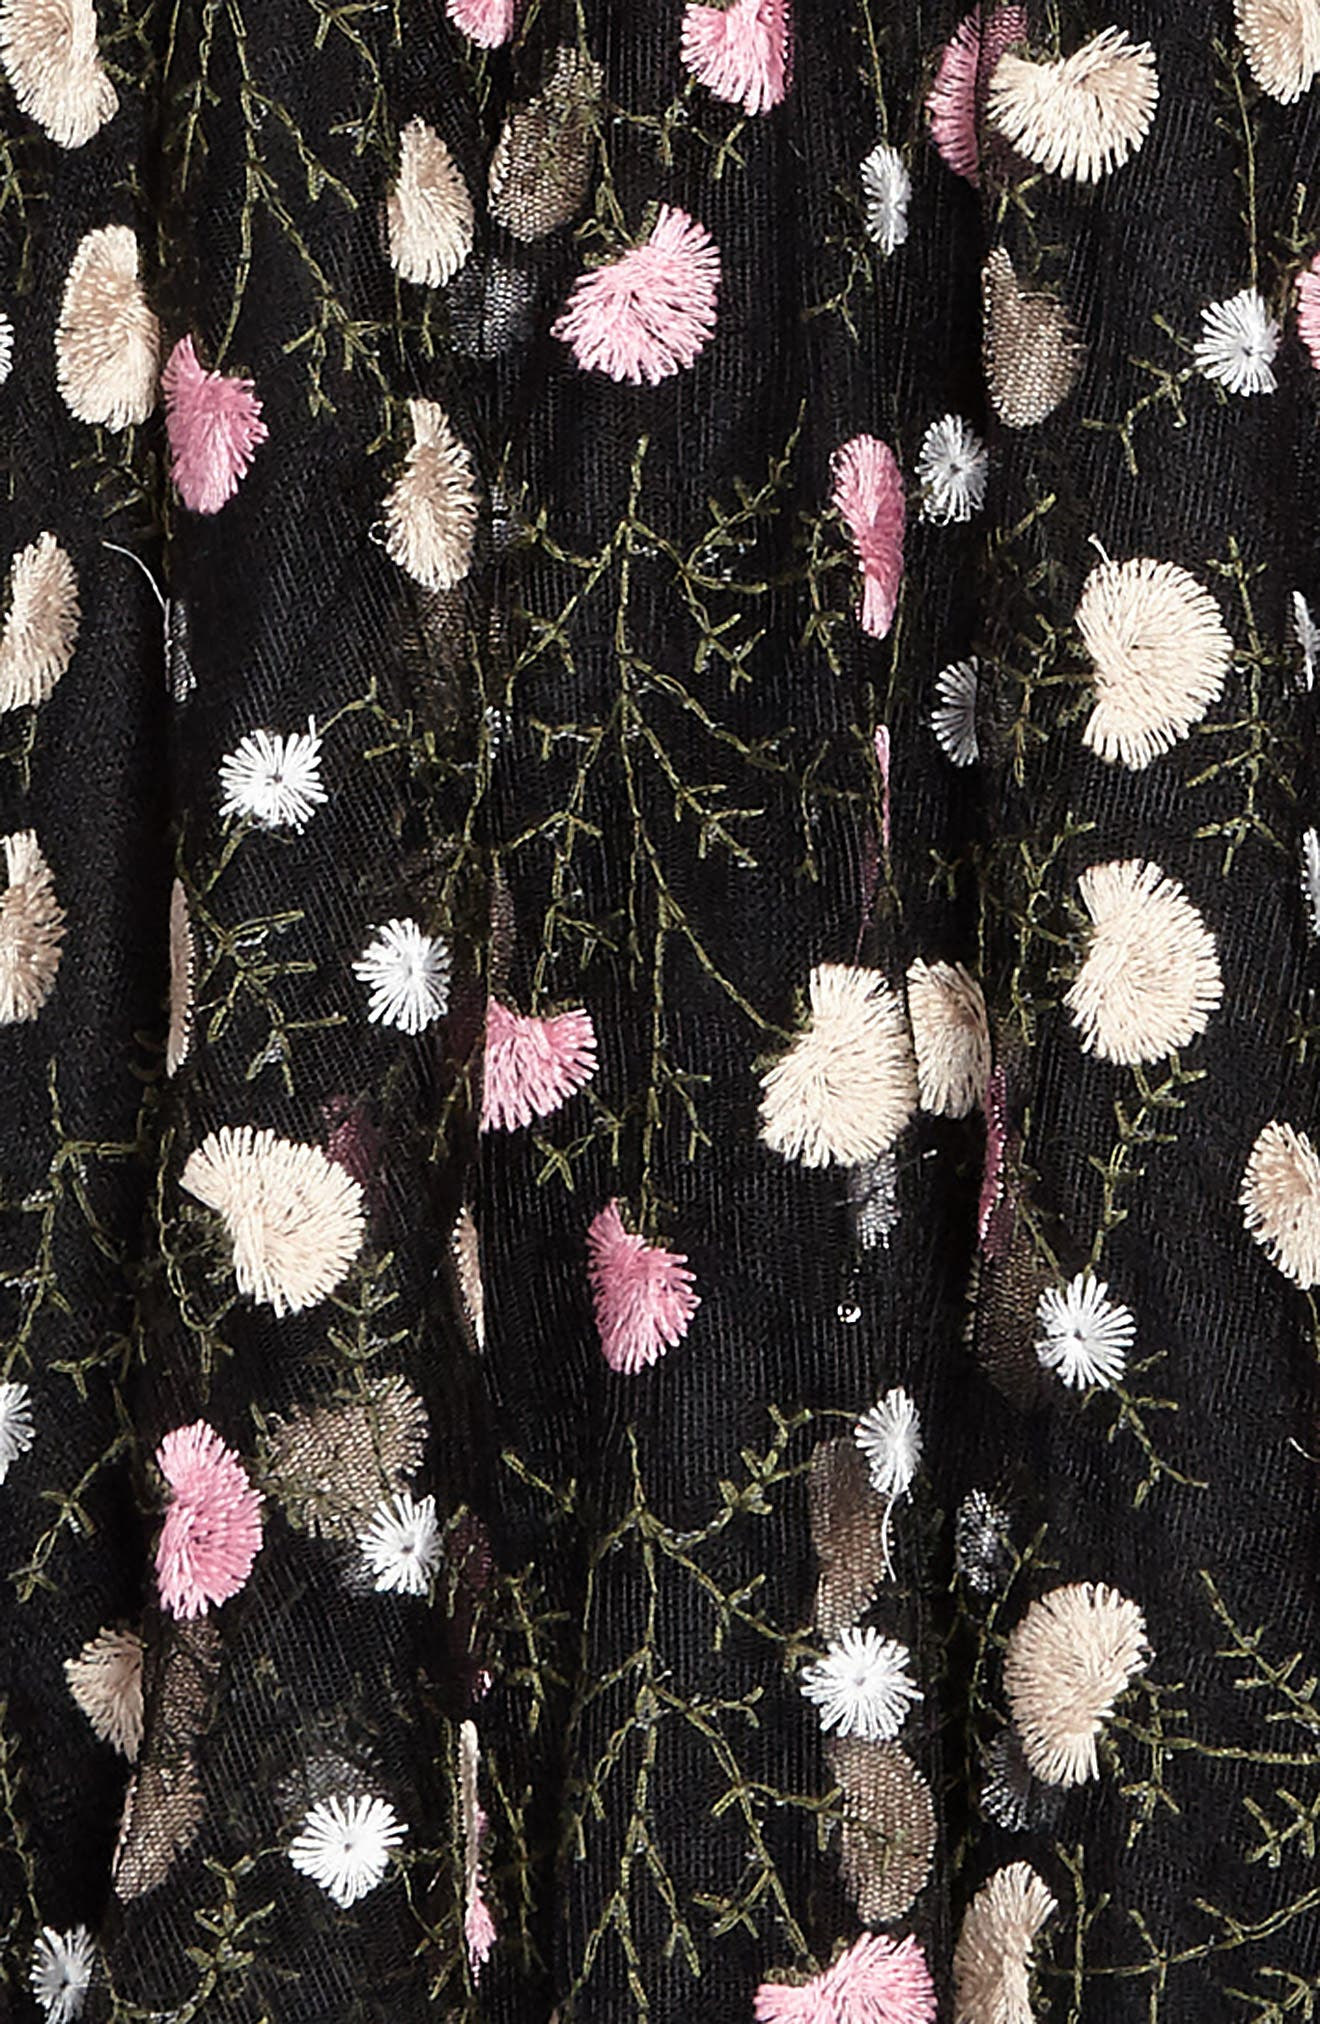 Nancy Embroidered Mesh Dress,                             Alternate thumbnail 3, color,                             Black